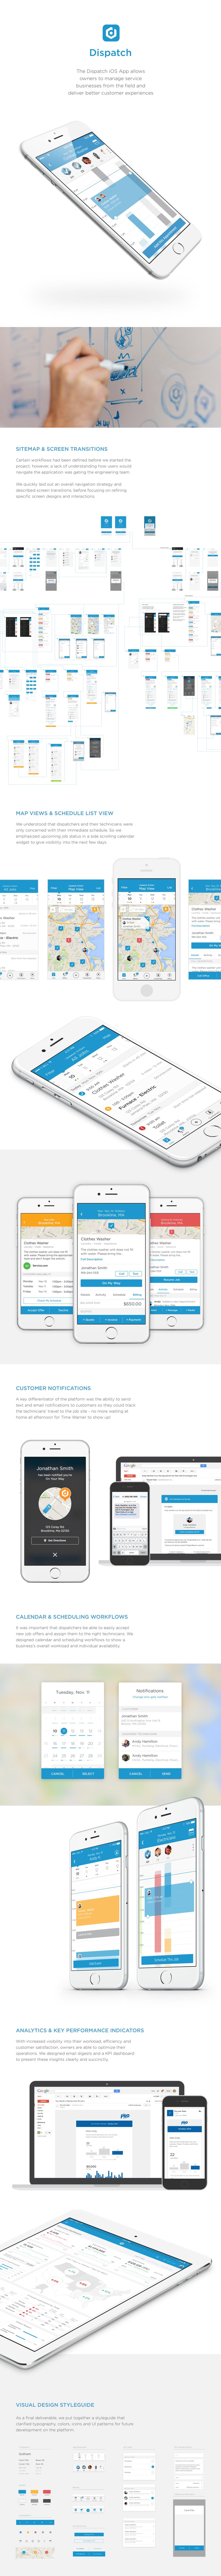 Dispatch Mobile iOS App Design on Behance